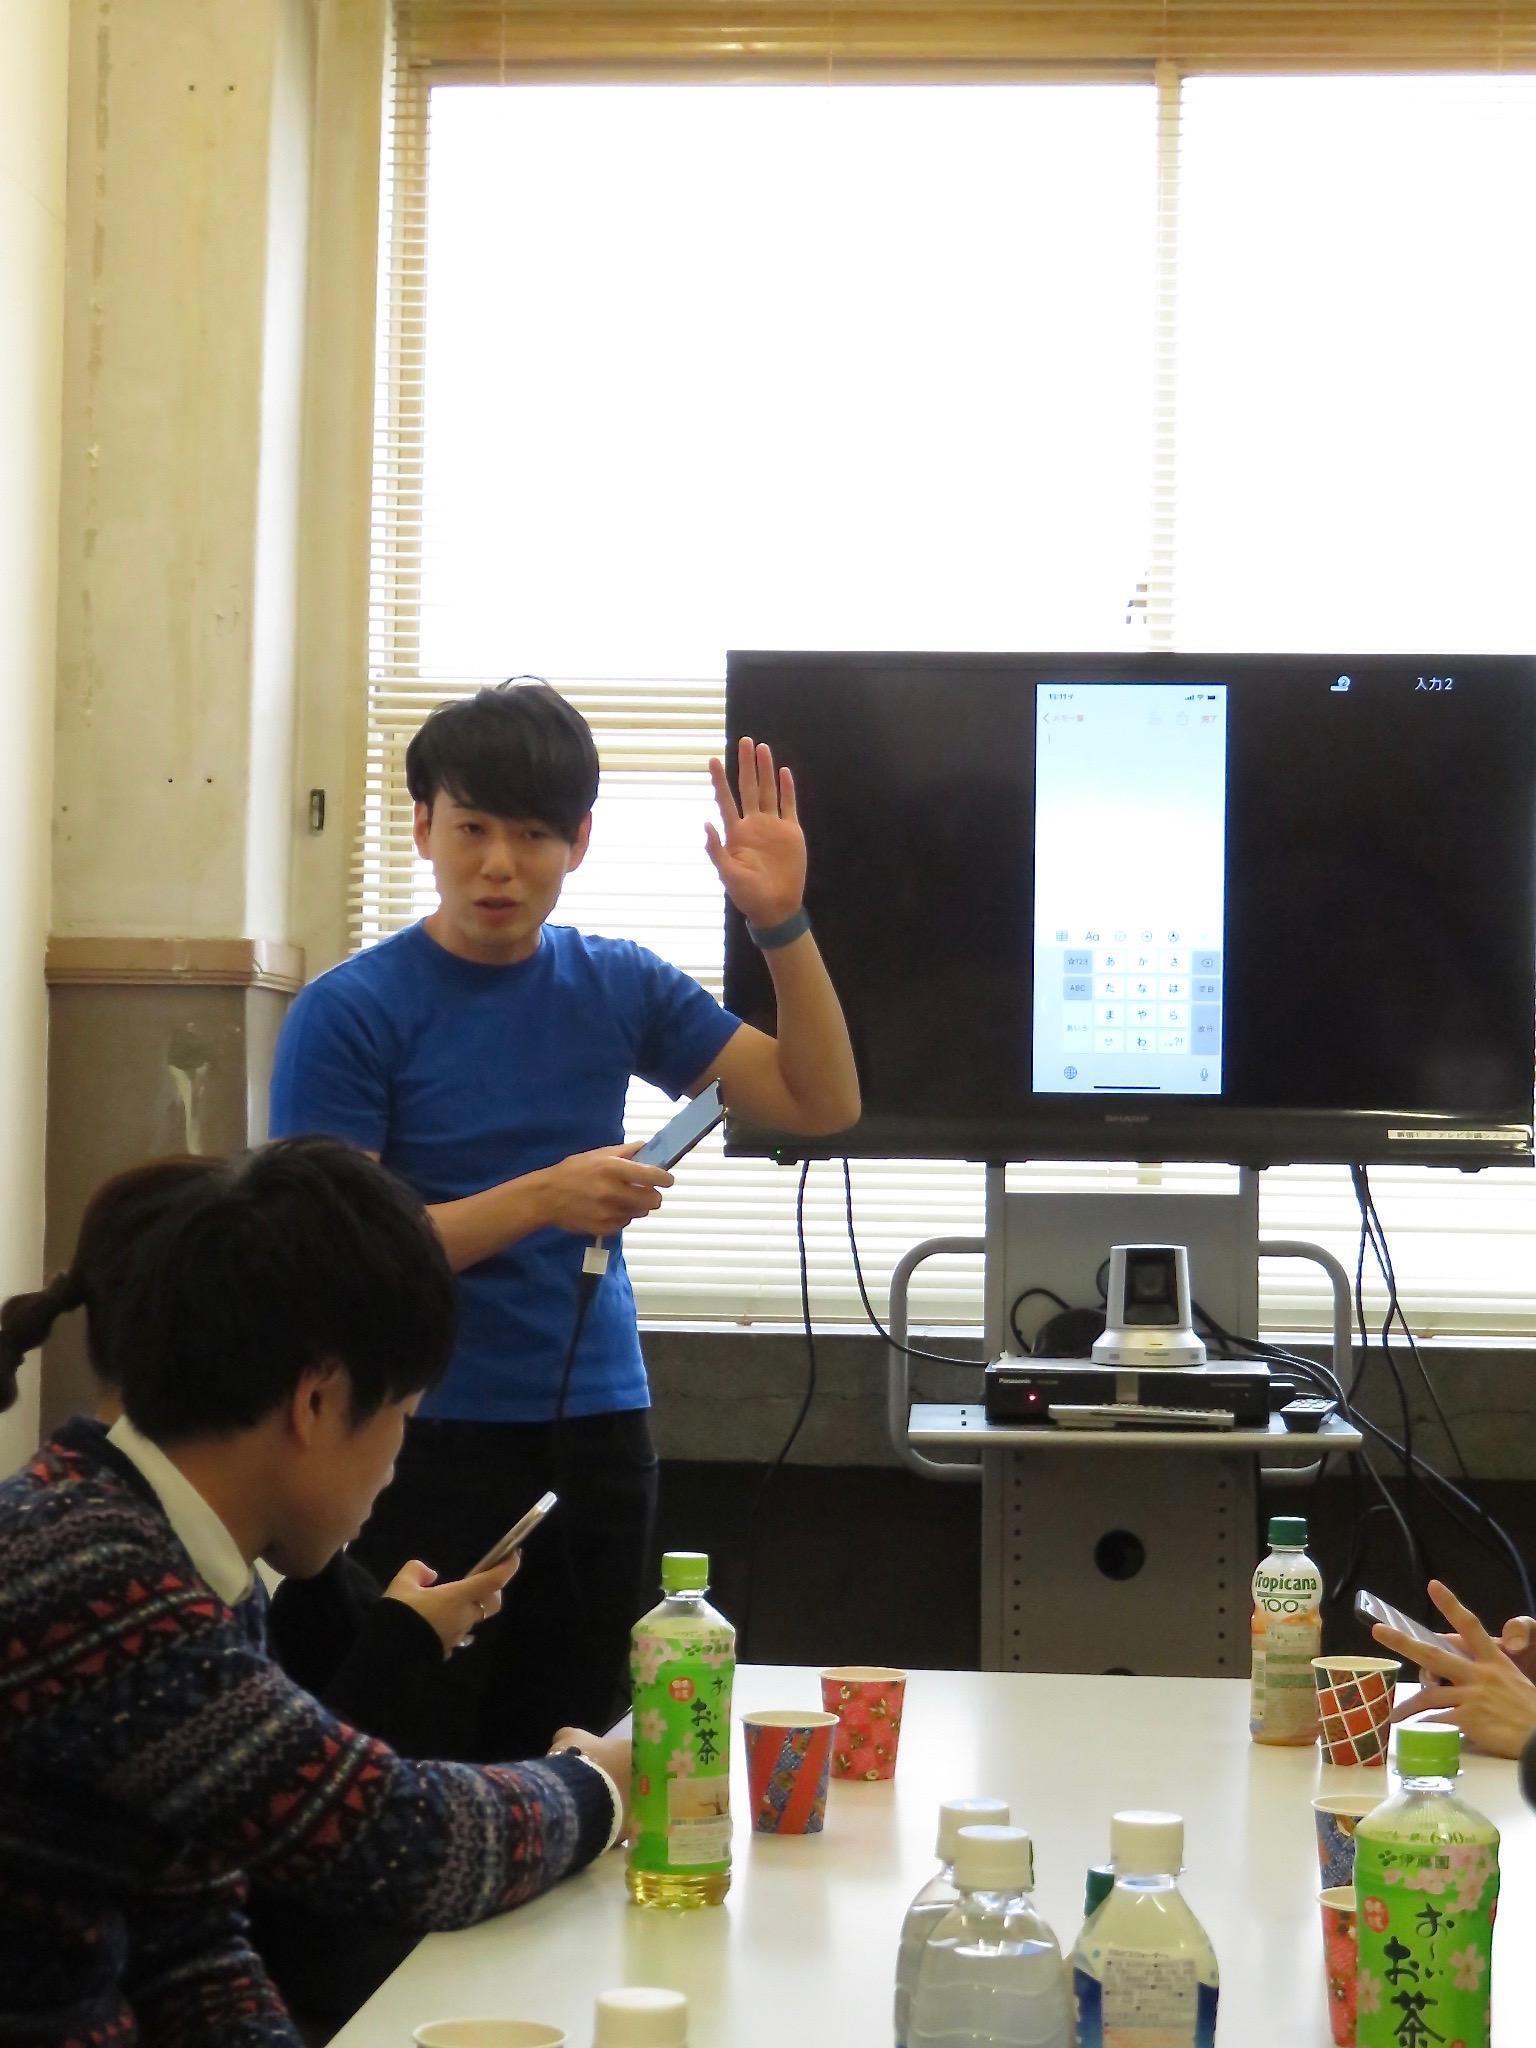 http://news.yoshimoto.co.jp/20190201195236-d9de8092e62d96aaa659a741cffa13e7c6cd859b.jpeg